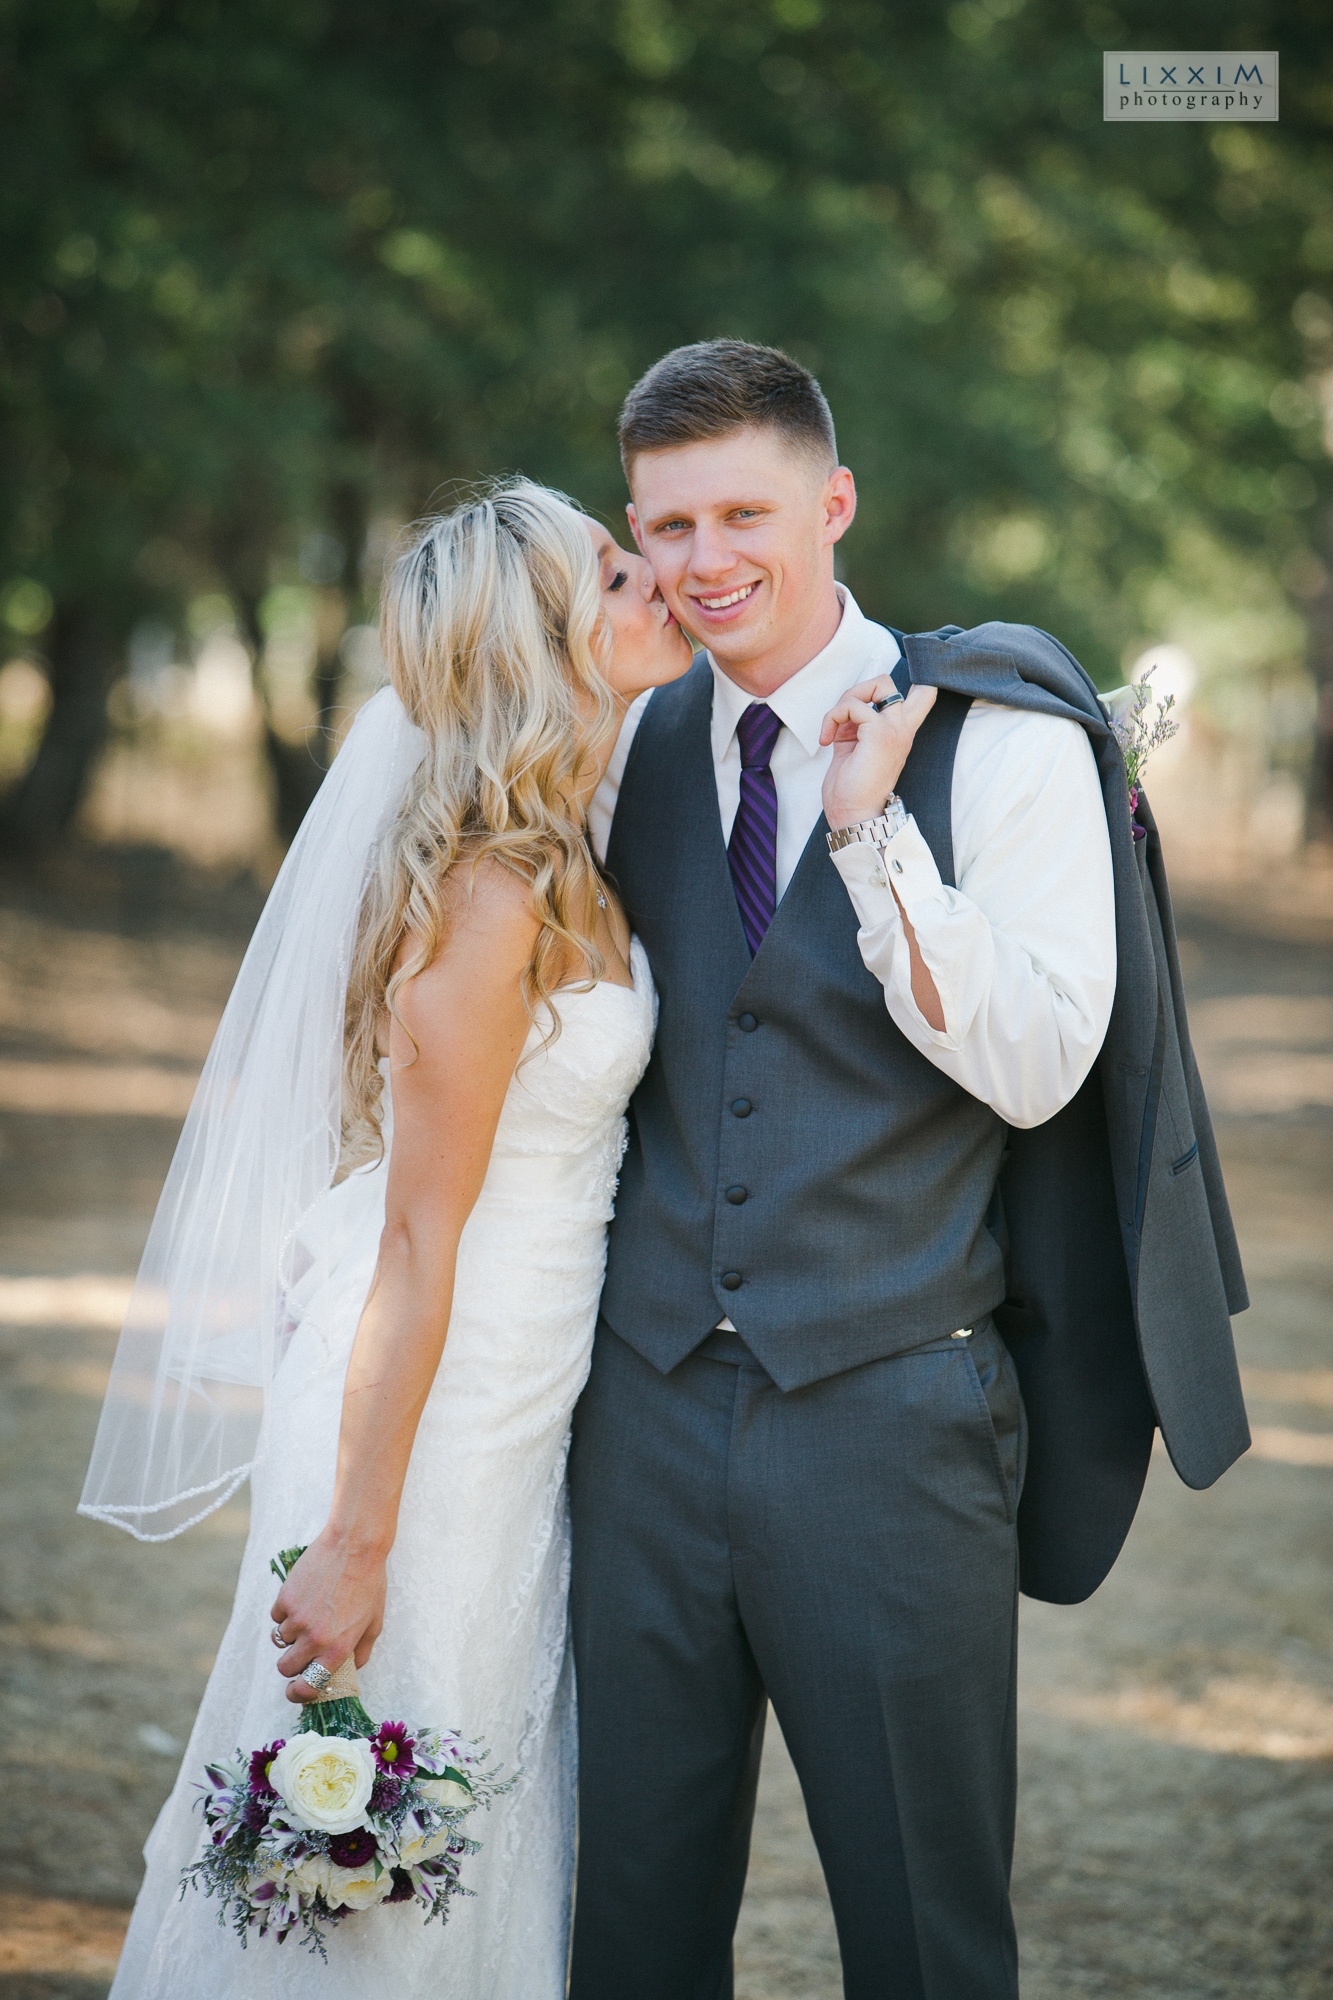 willow-creek-events-wedding-photographer-lixxim-love-kiss